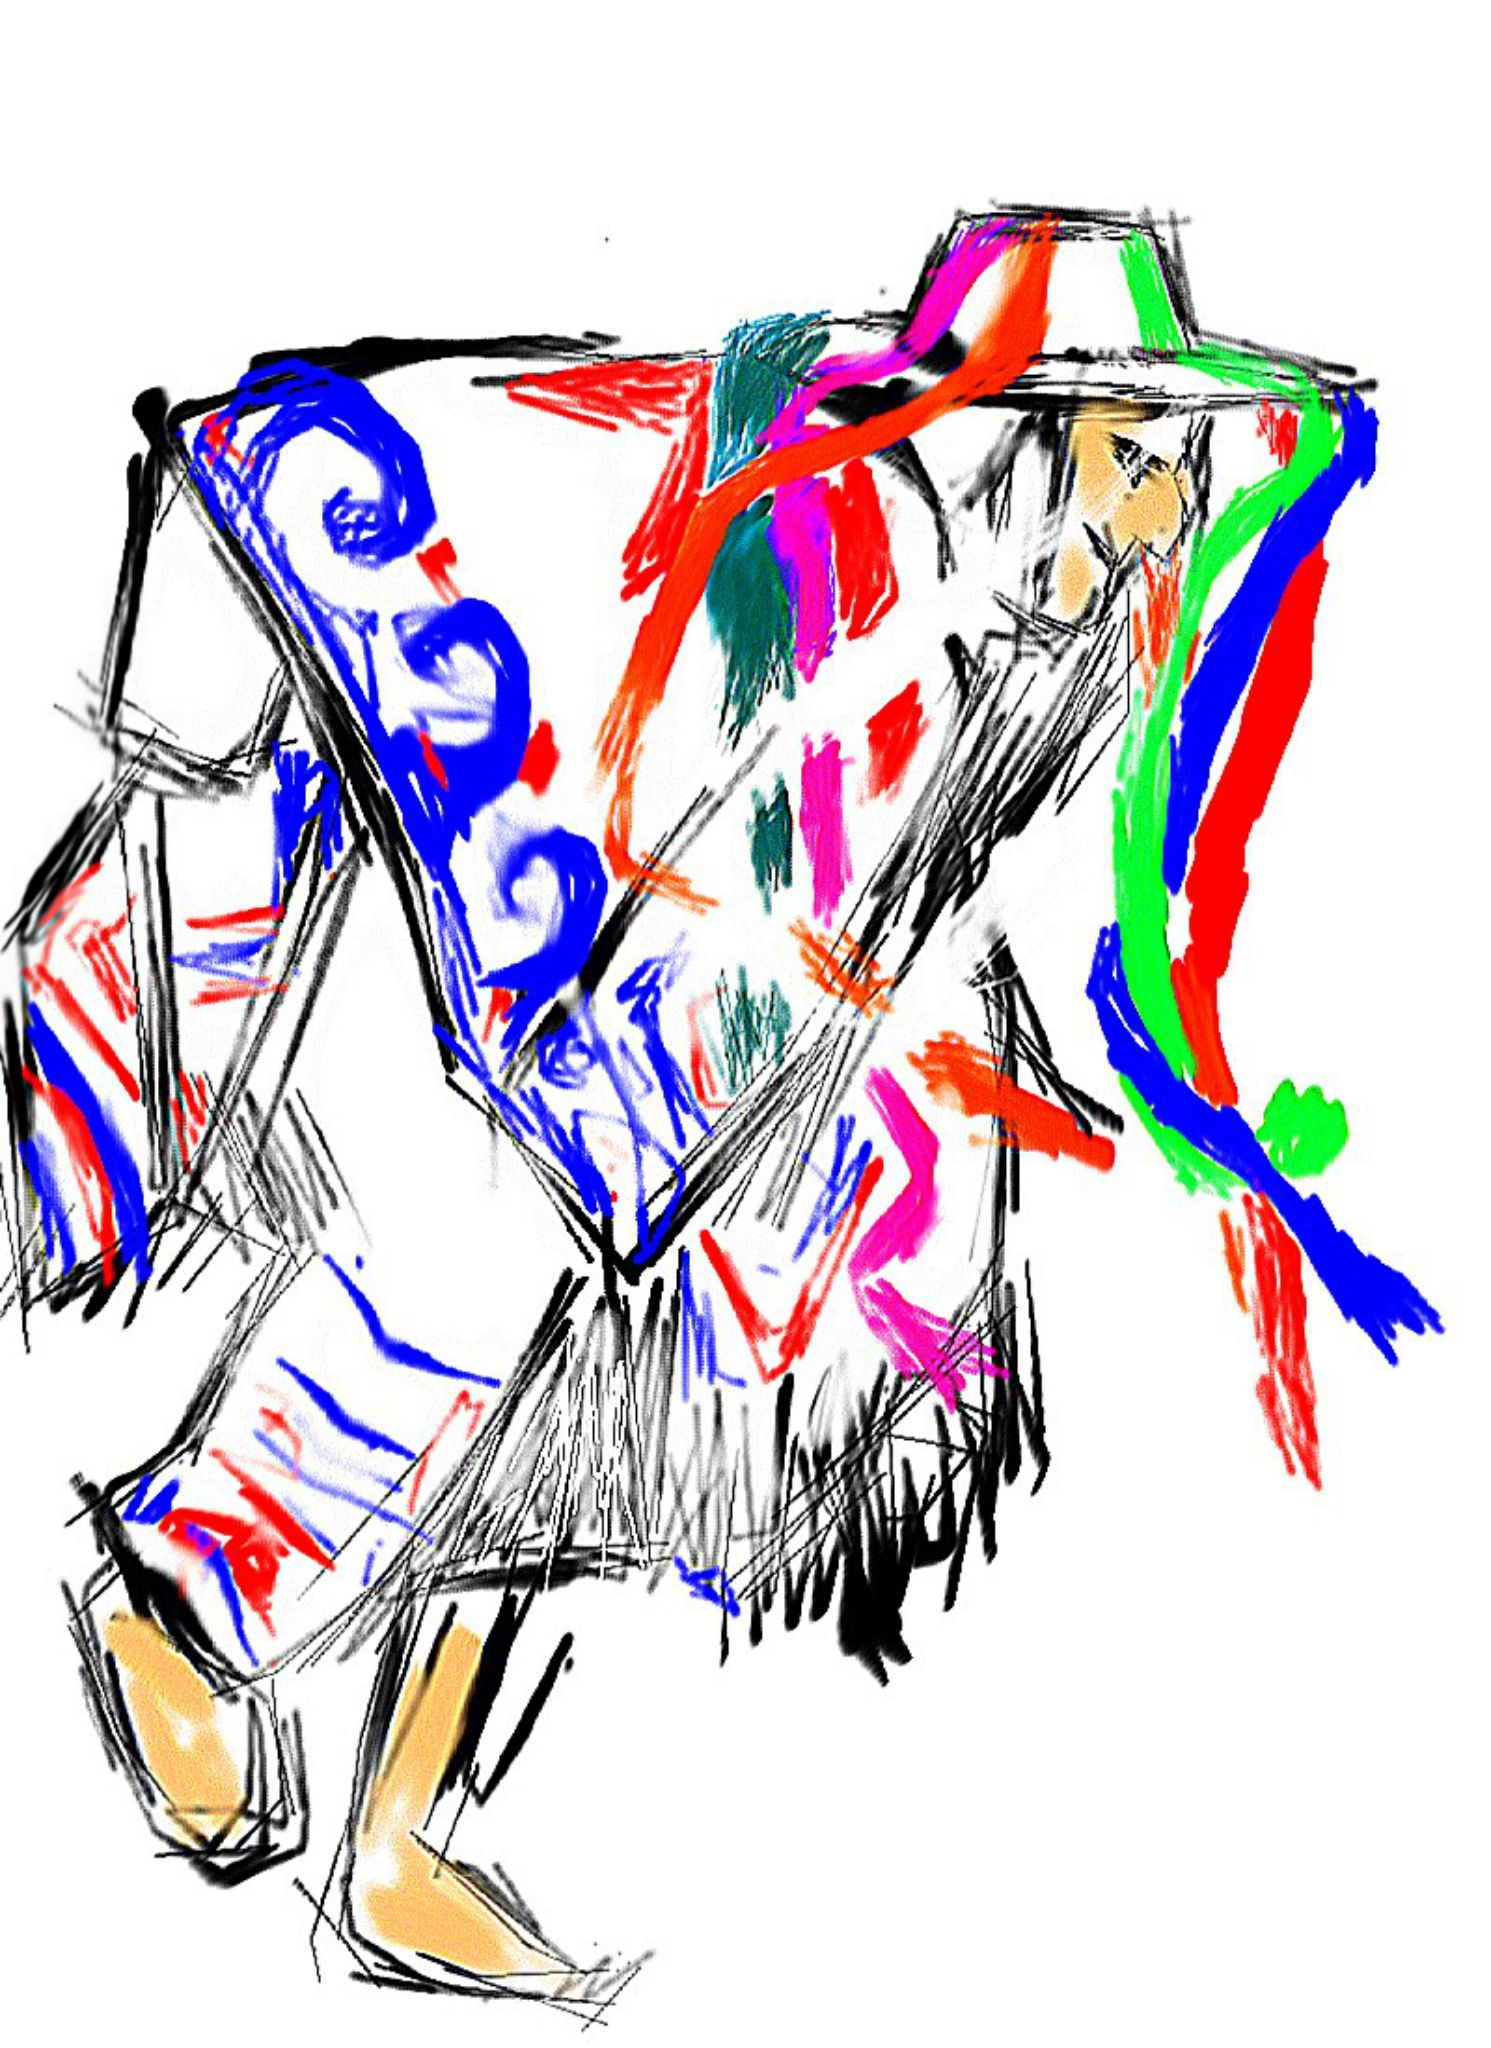 La danza de los viejitos | Danza dibujo, Pintura de camiseta, Dibujos